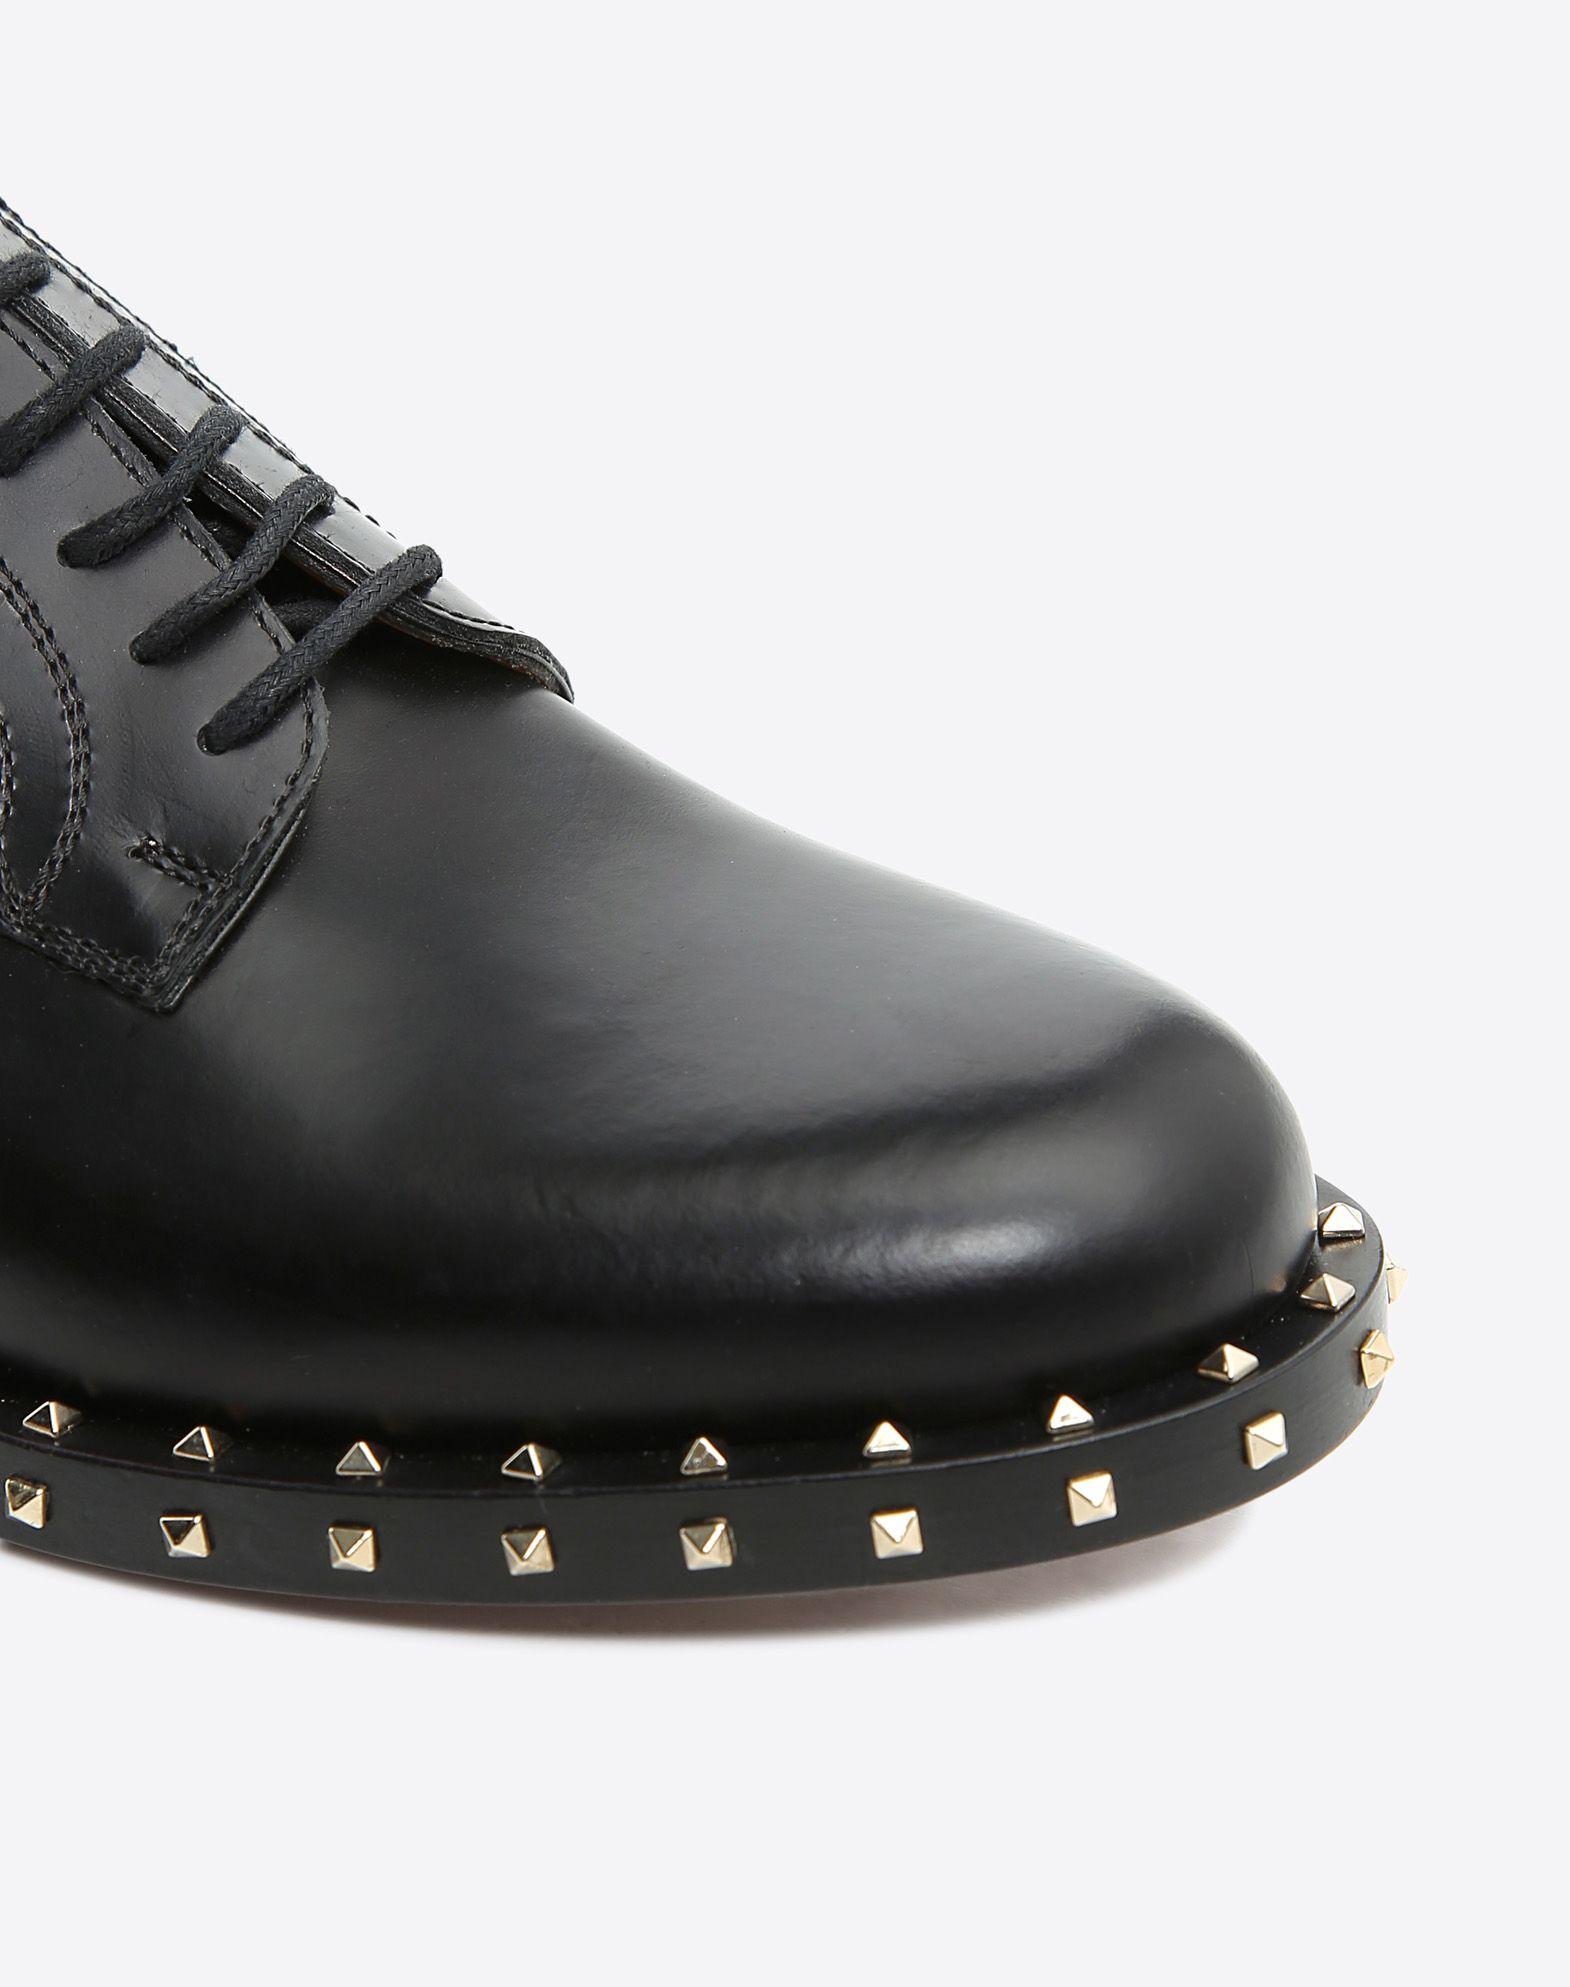 VALENTINO GARAVANI Soul Rockstud 德比鞋 绑带鞋 D b